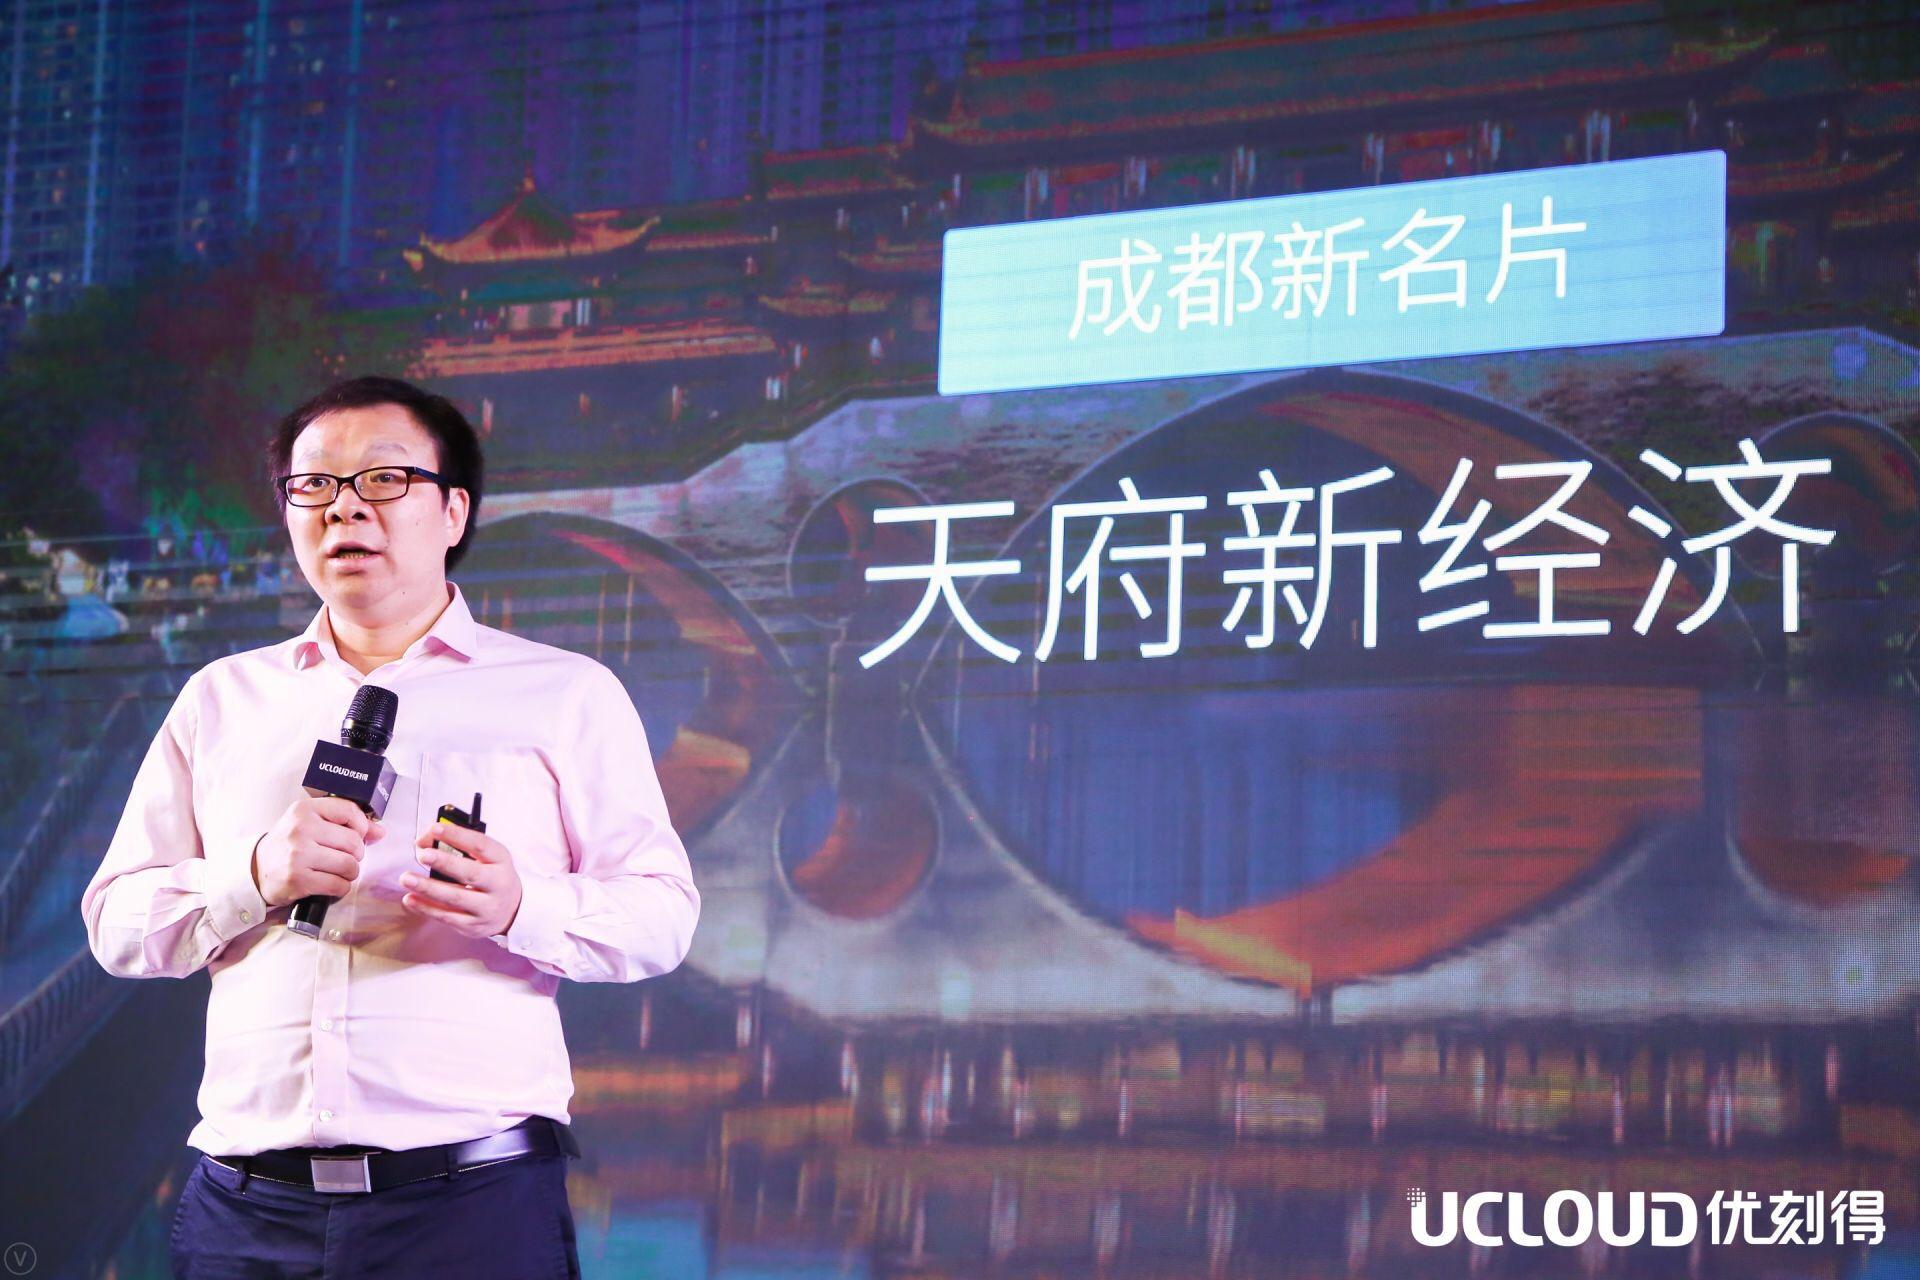 UCloud吹响大西南集结号,助力川渝地区数字产业智能化